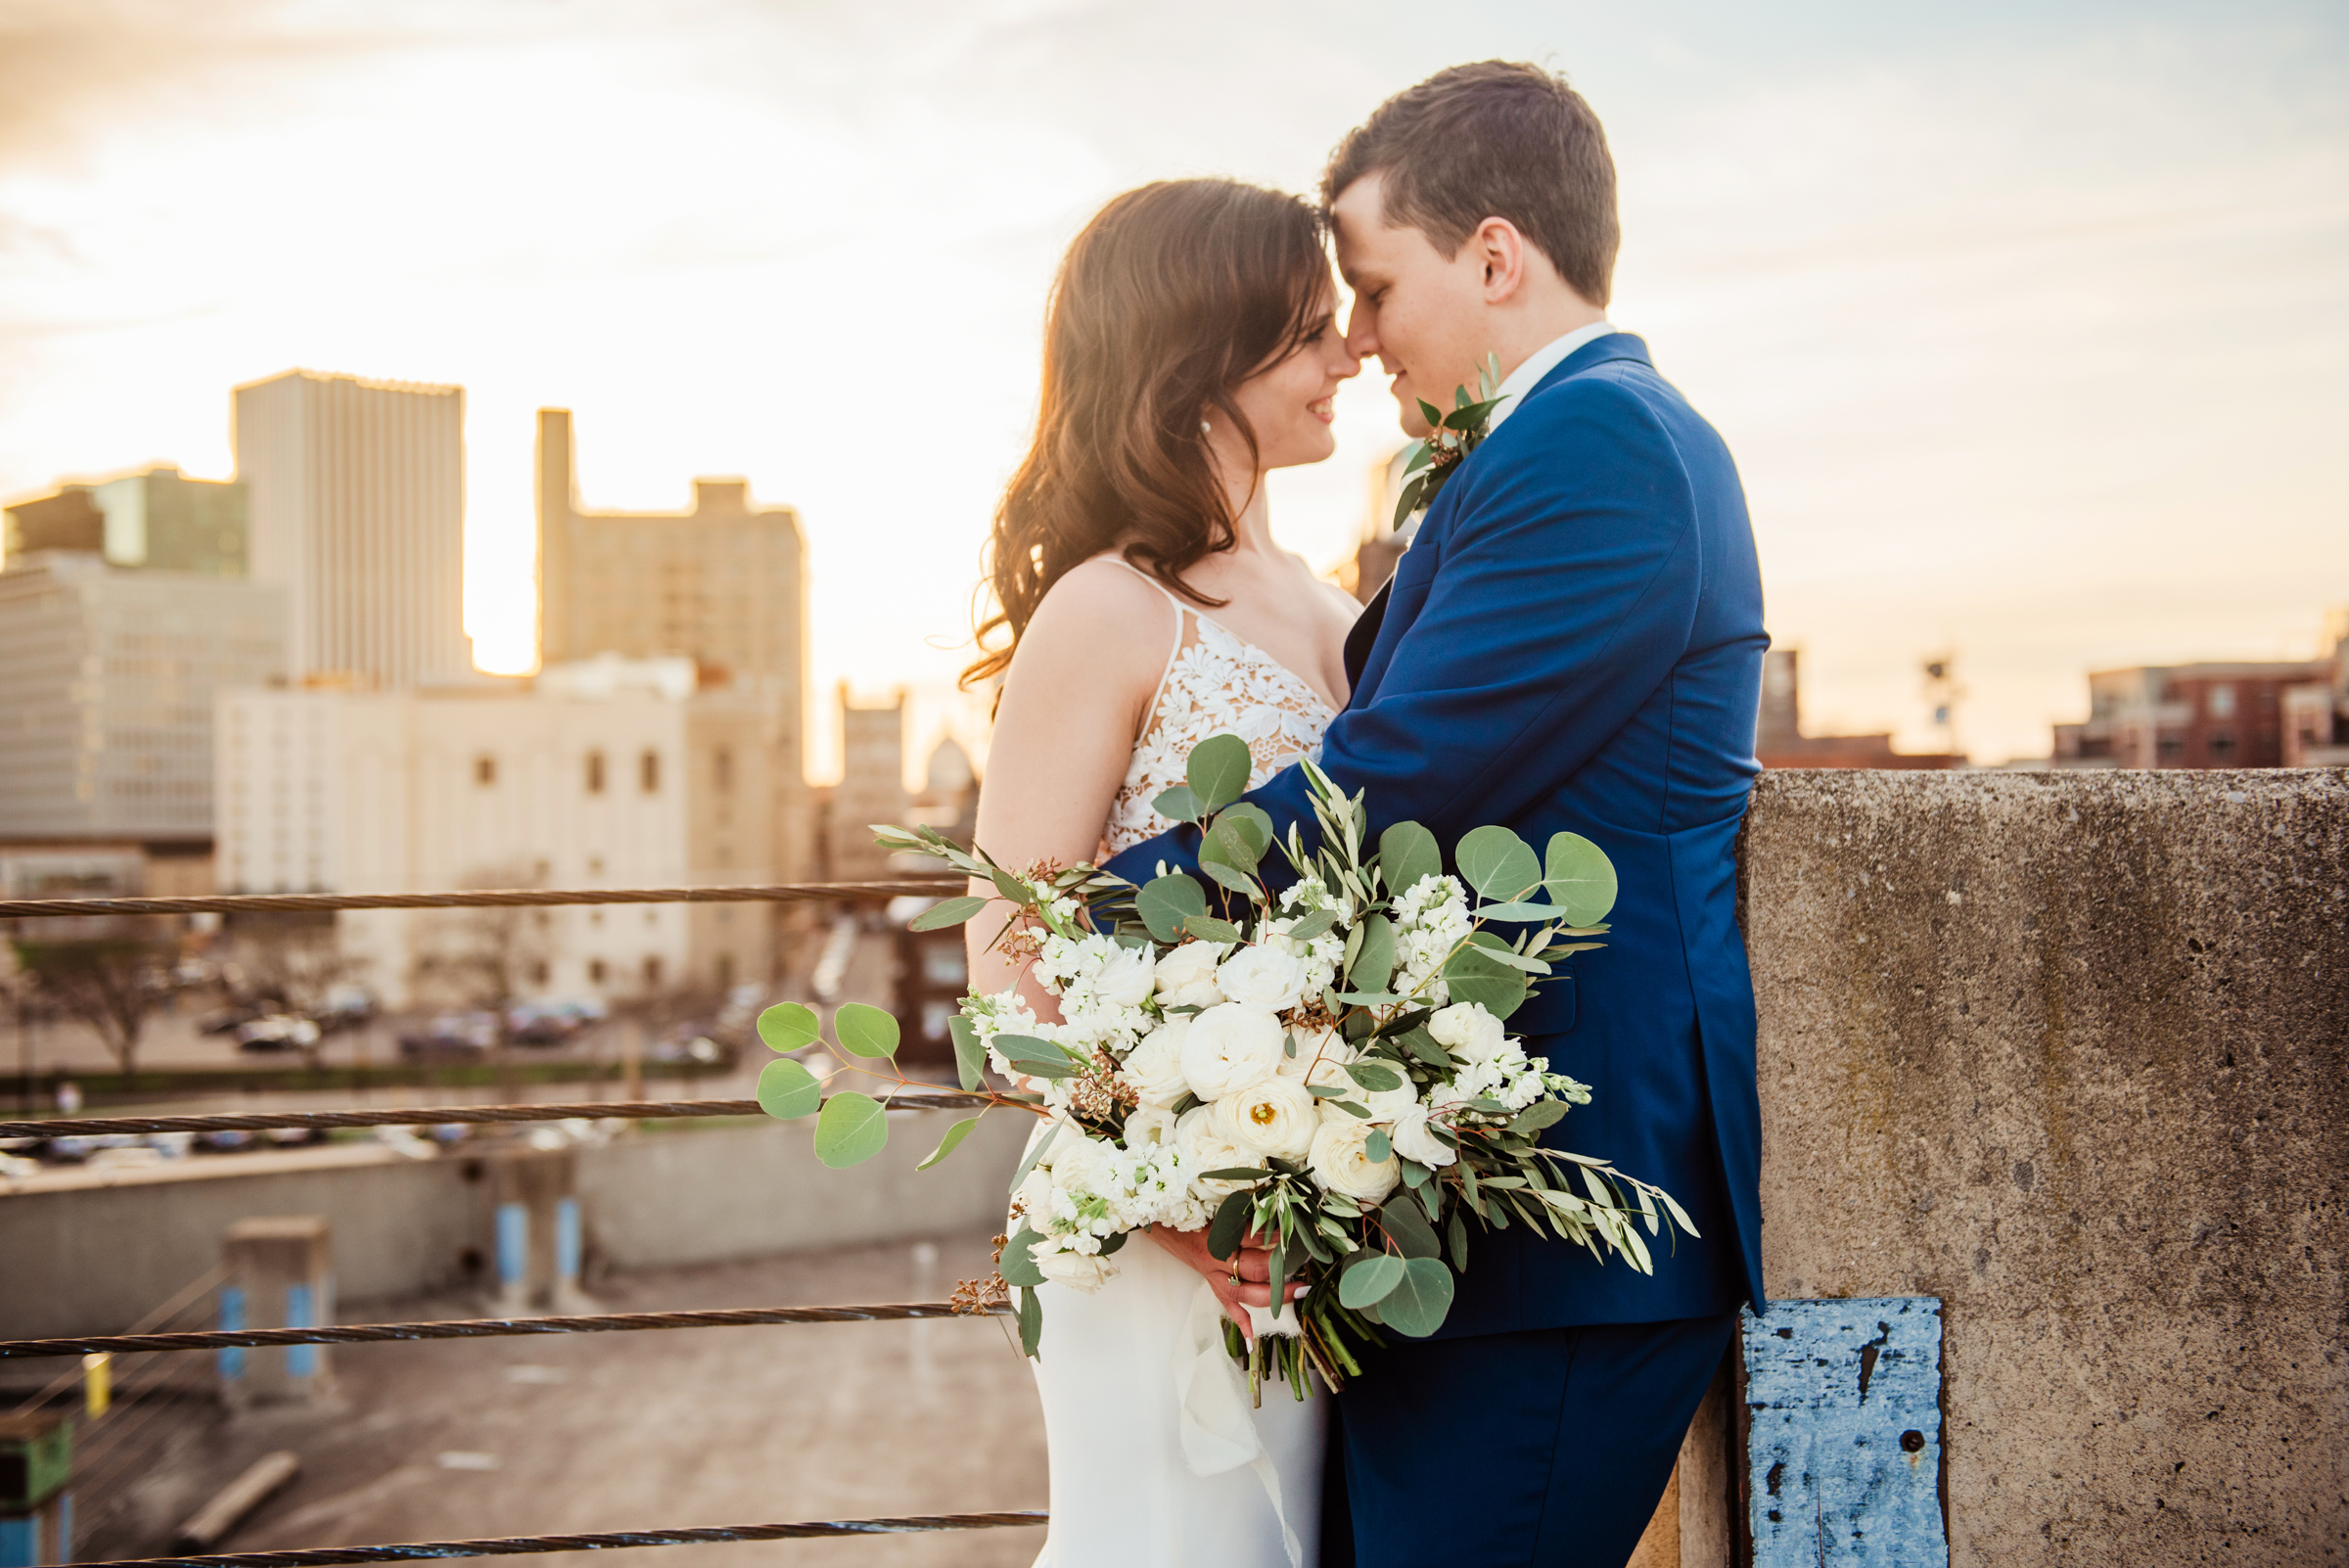 The_Arbor_LoftRochester_Wedding_JILL_STUDIO_Rochester_NY_Photographer_192210.jpg